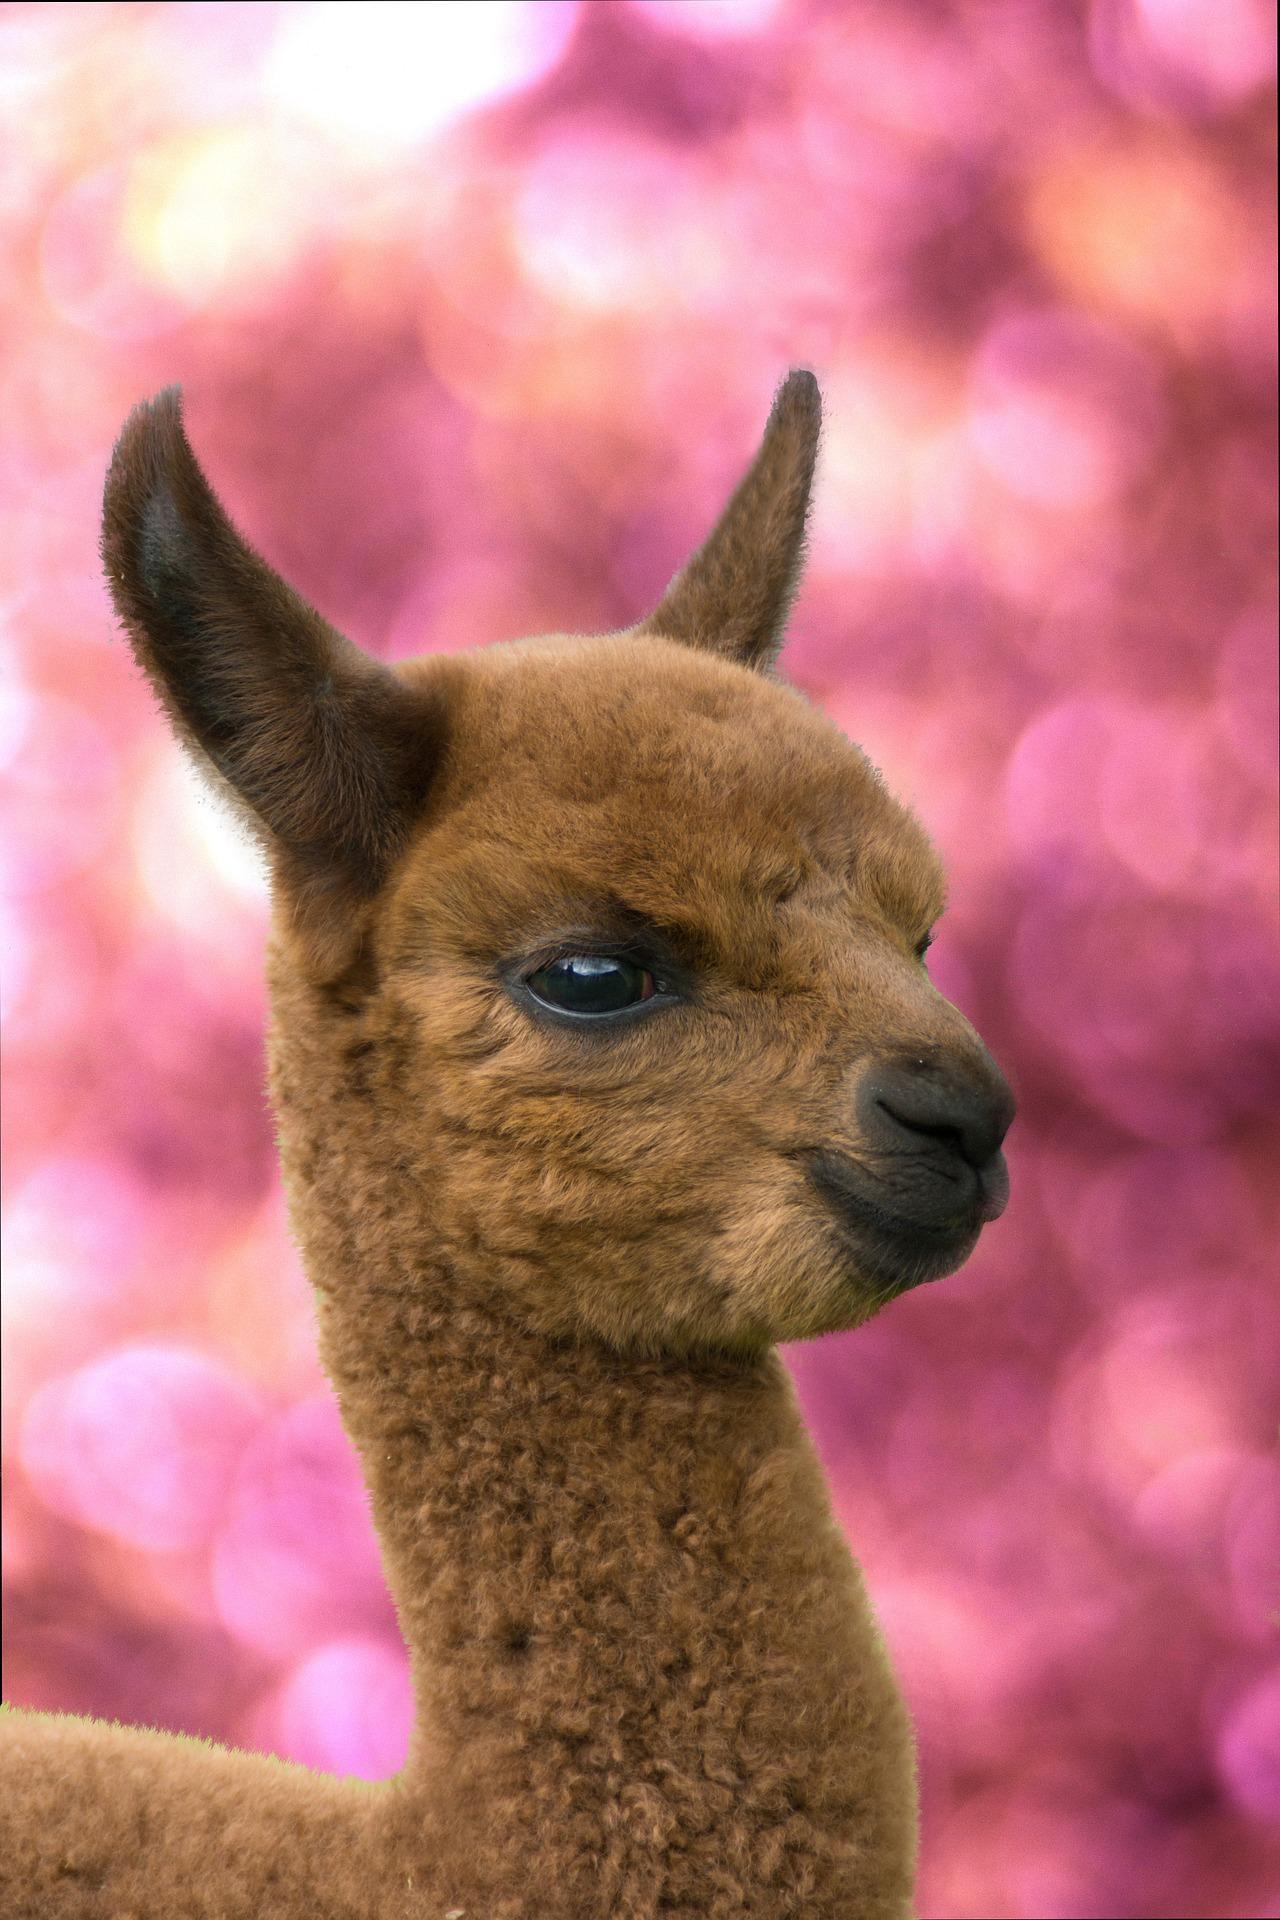 Alpaca Wallpaper Hd For Android Apk Download